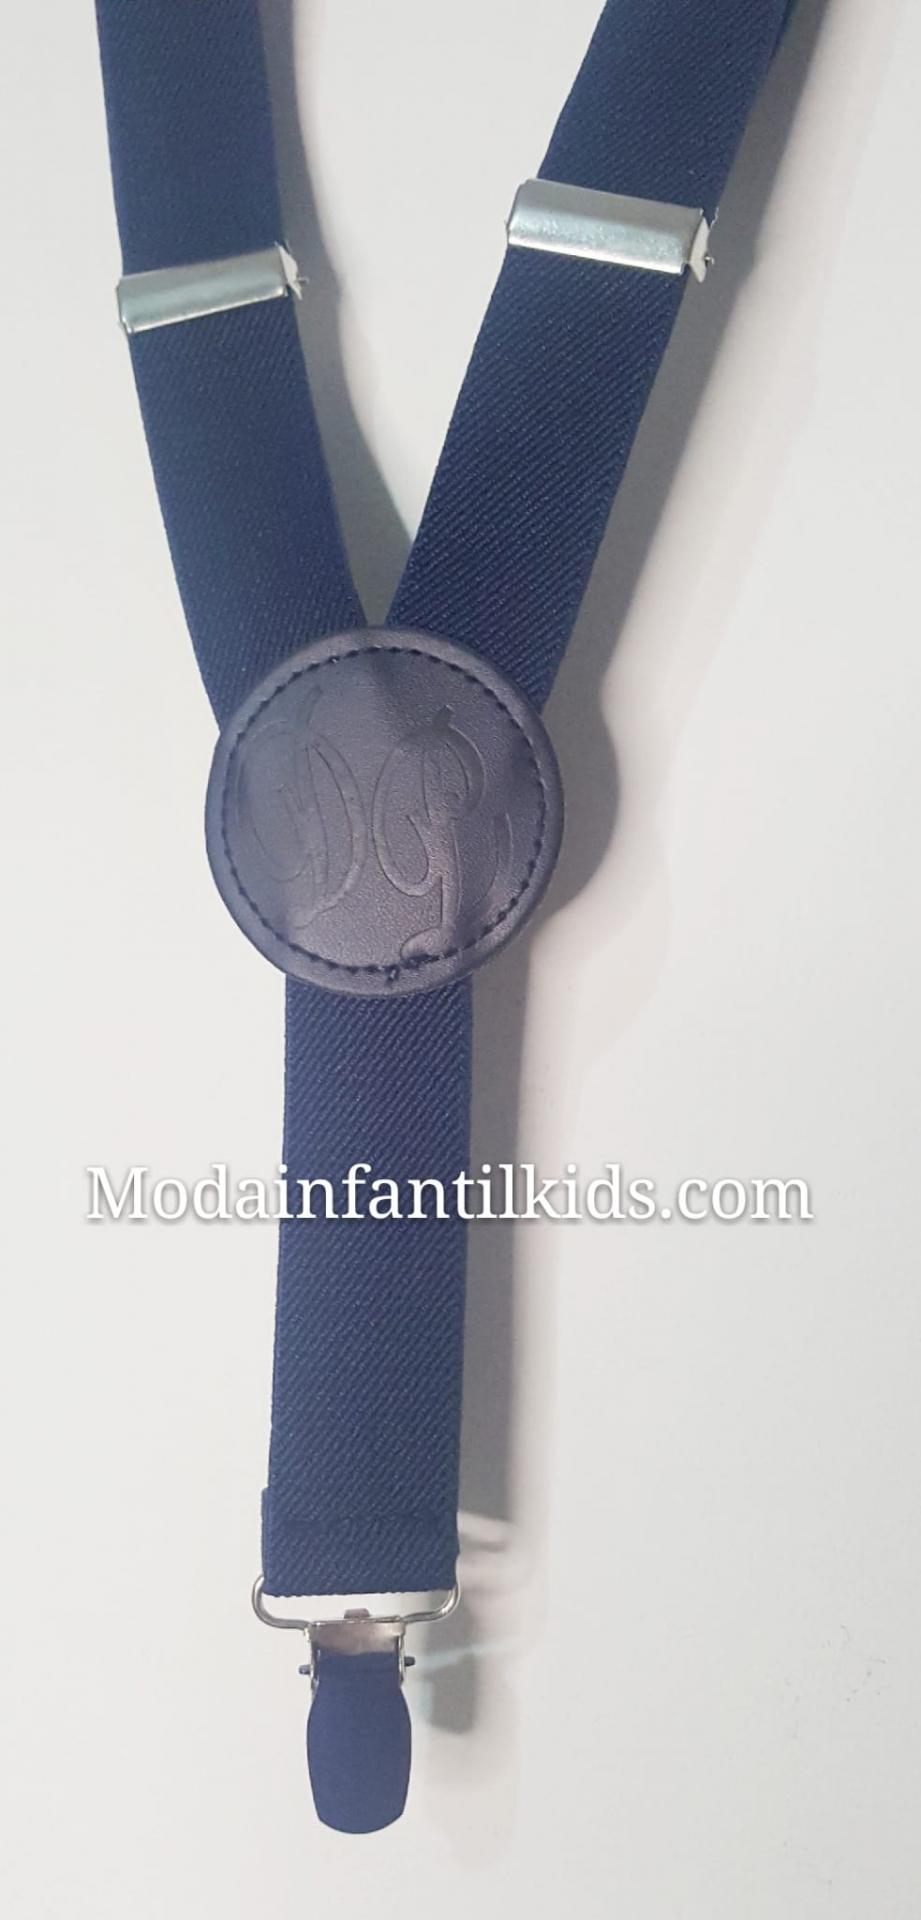 Tirante niño-bebe Dolce Petit azul marino 2100-t